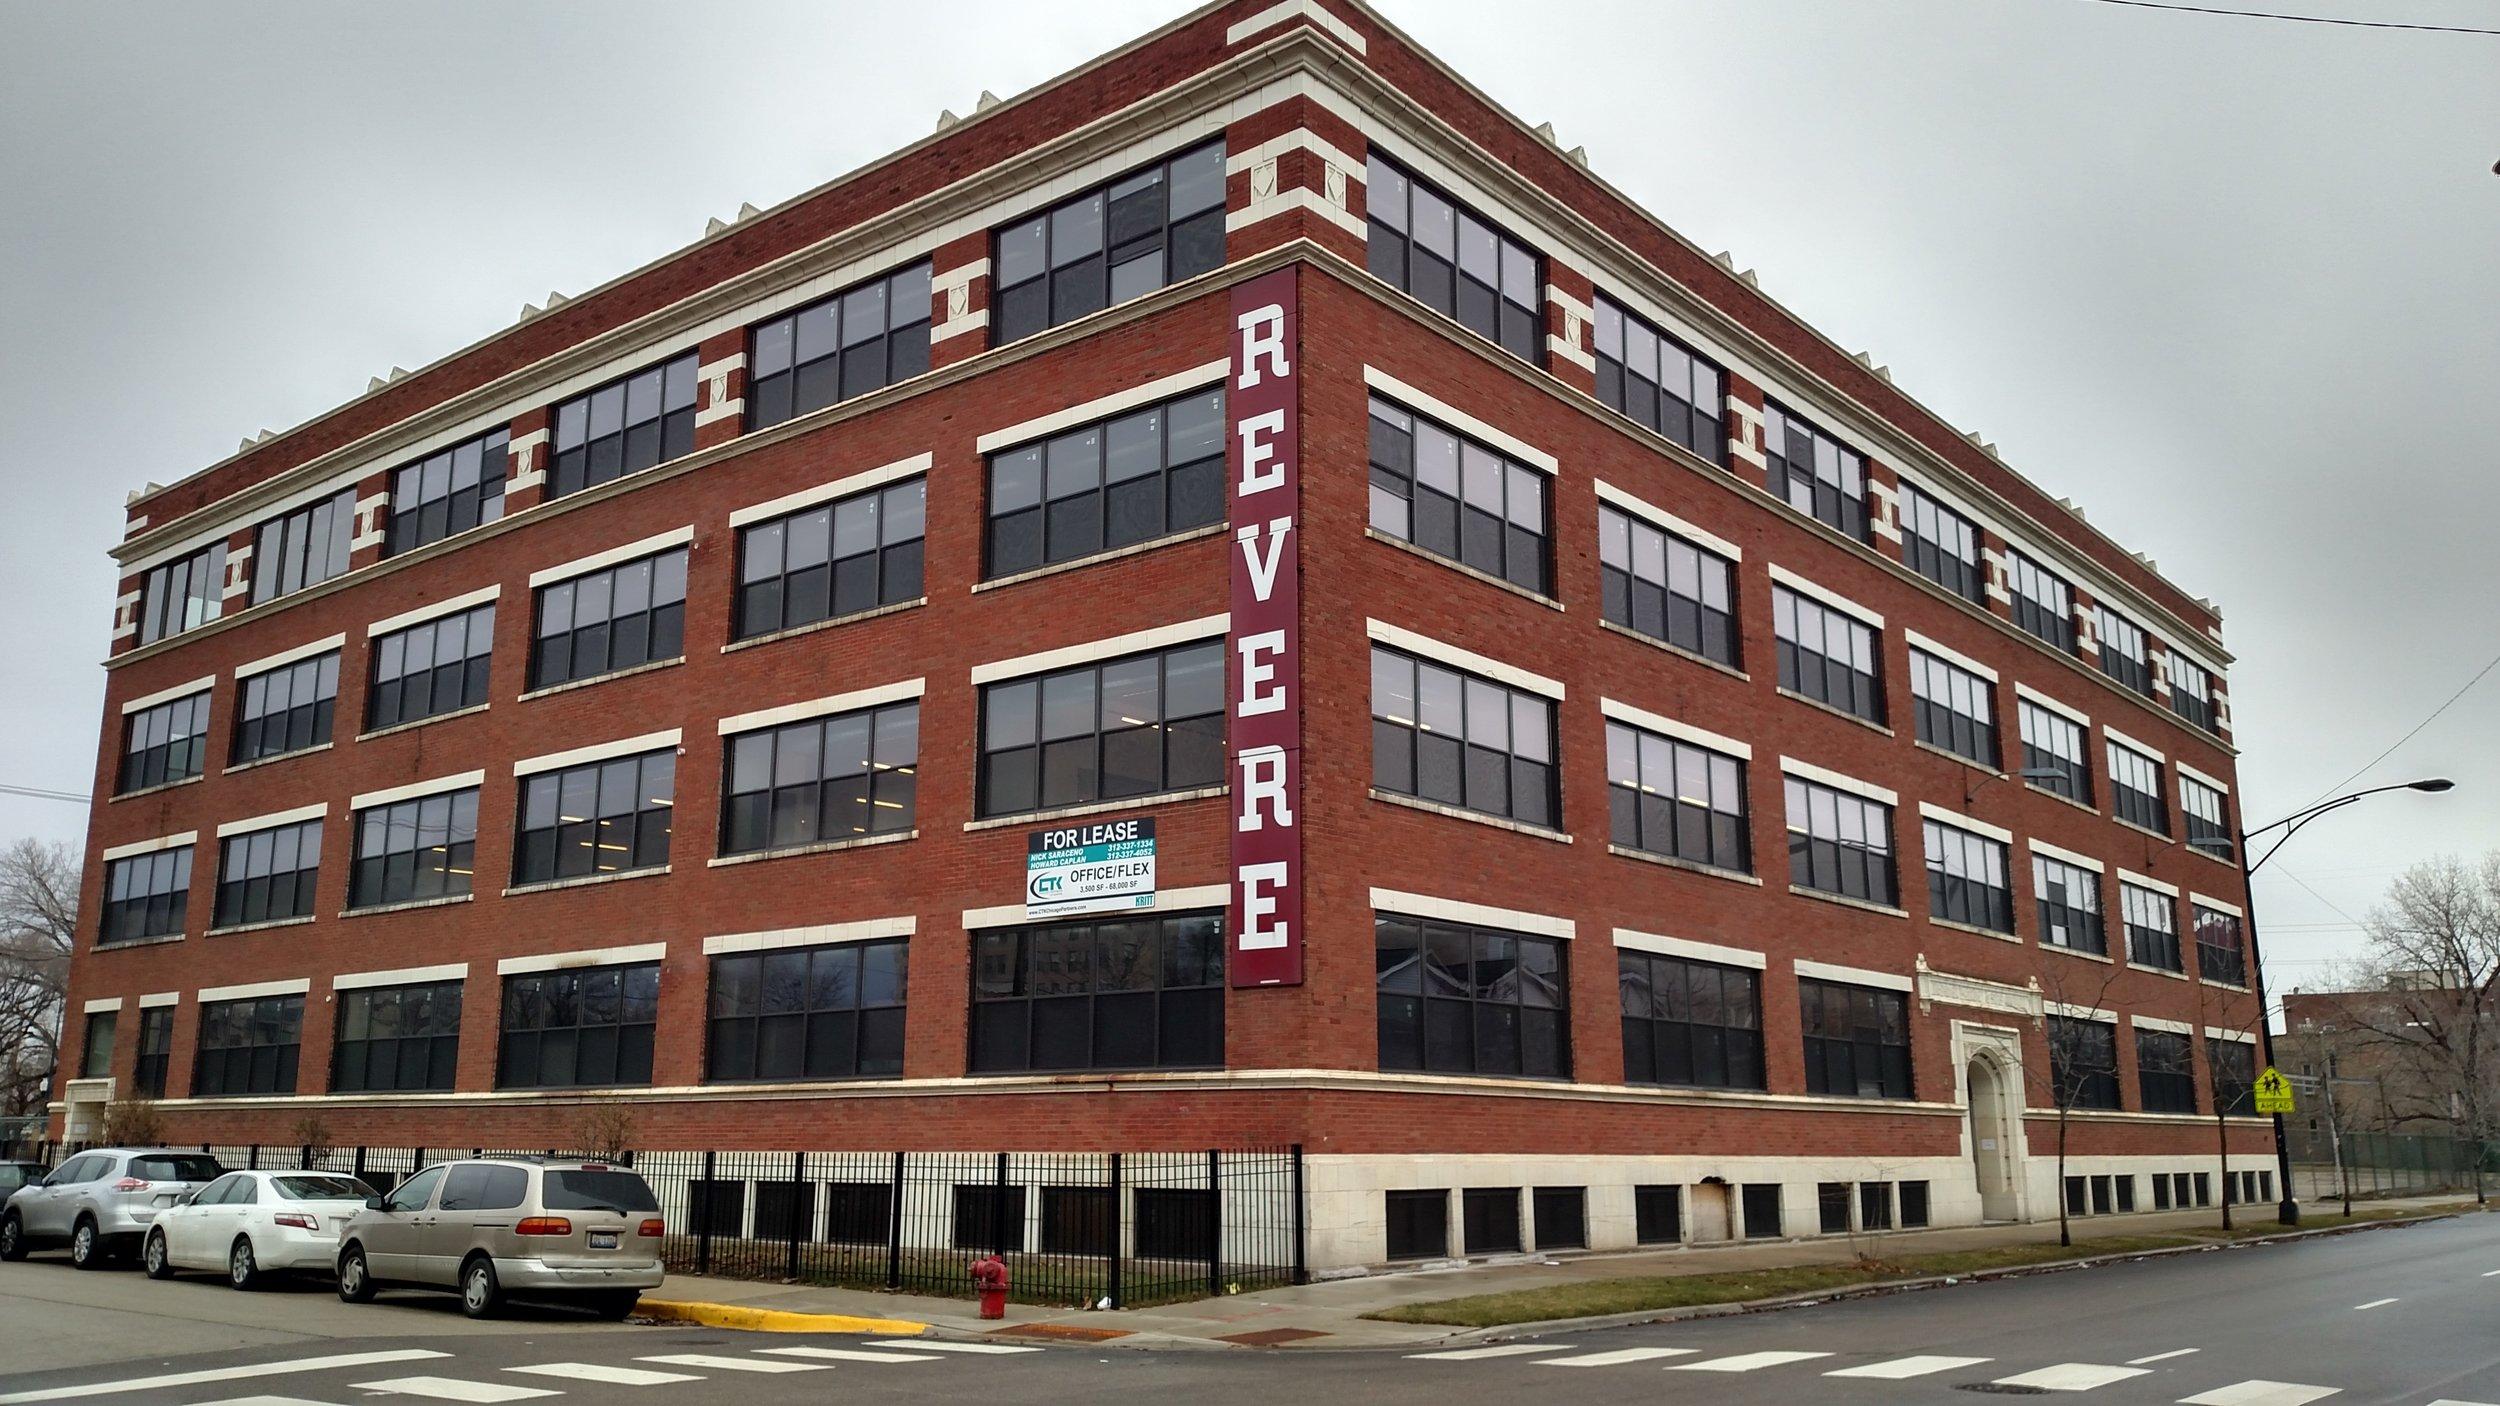 2501 W. Washington - Industrial loft / commercial